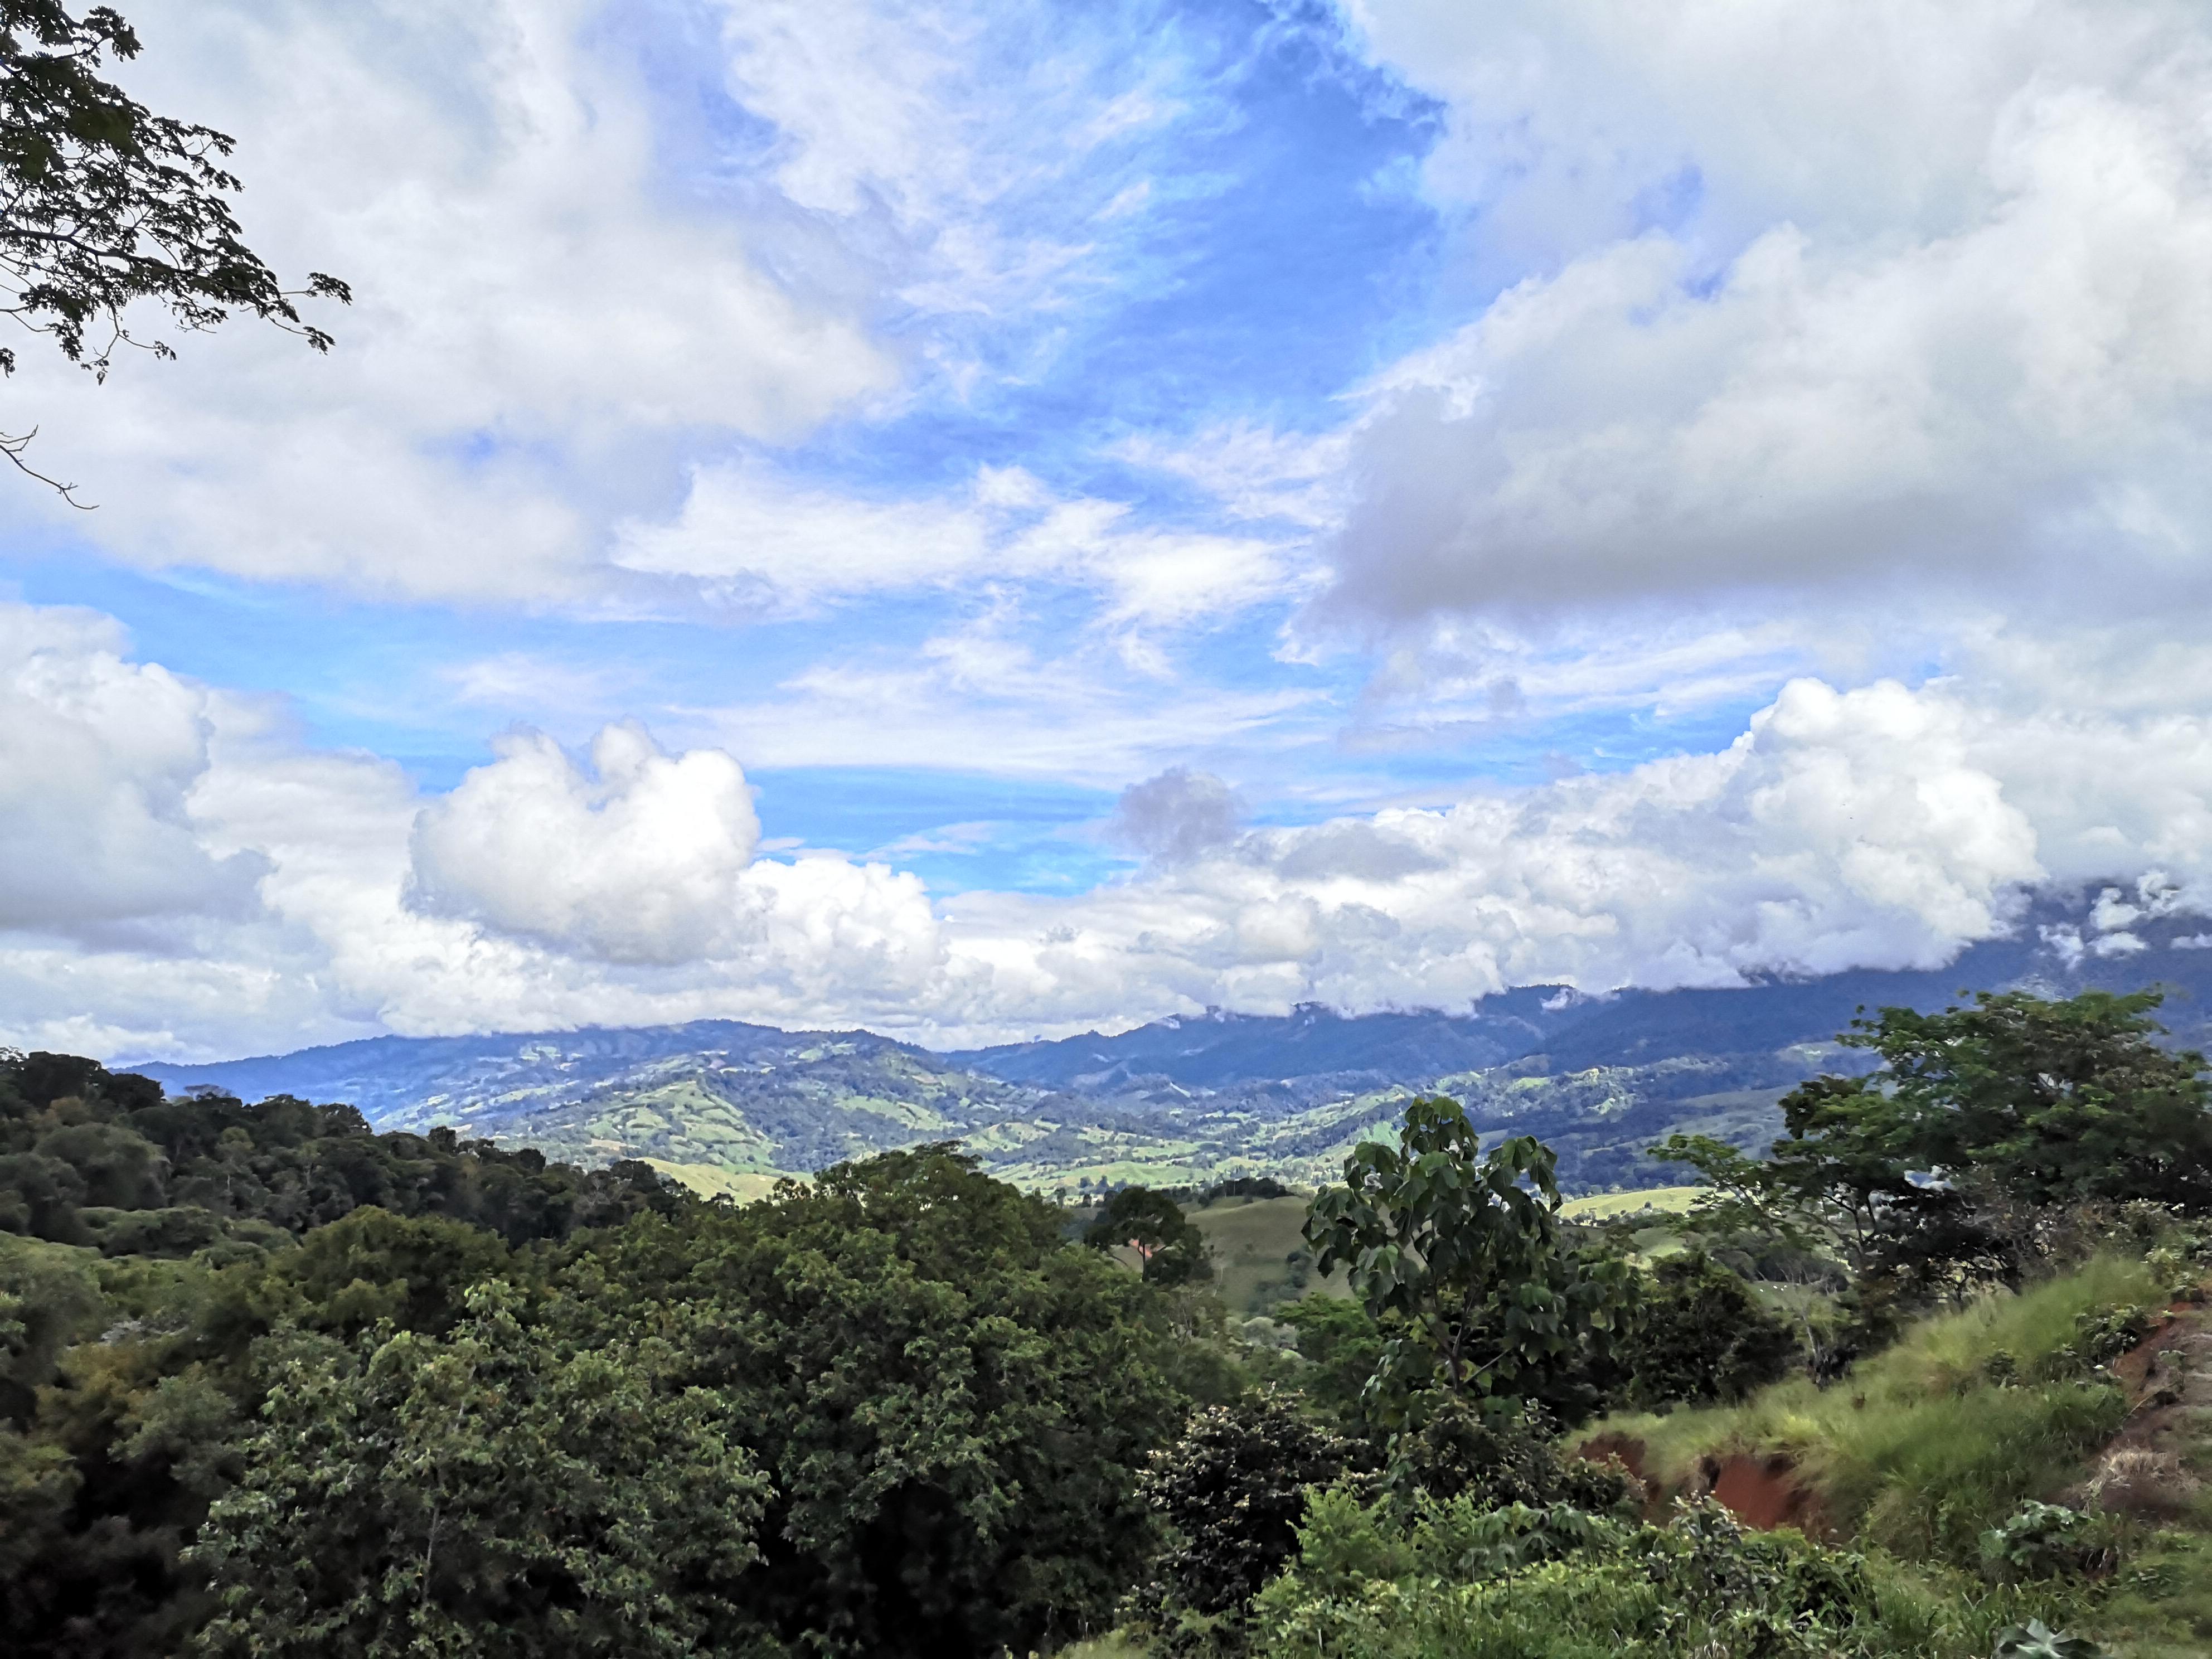 Beautiful lot with mountain views in Platanillo, Baru